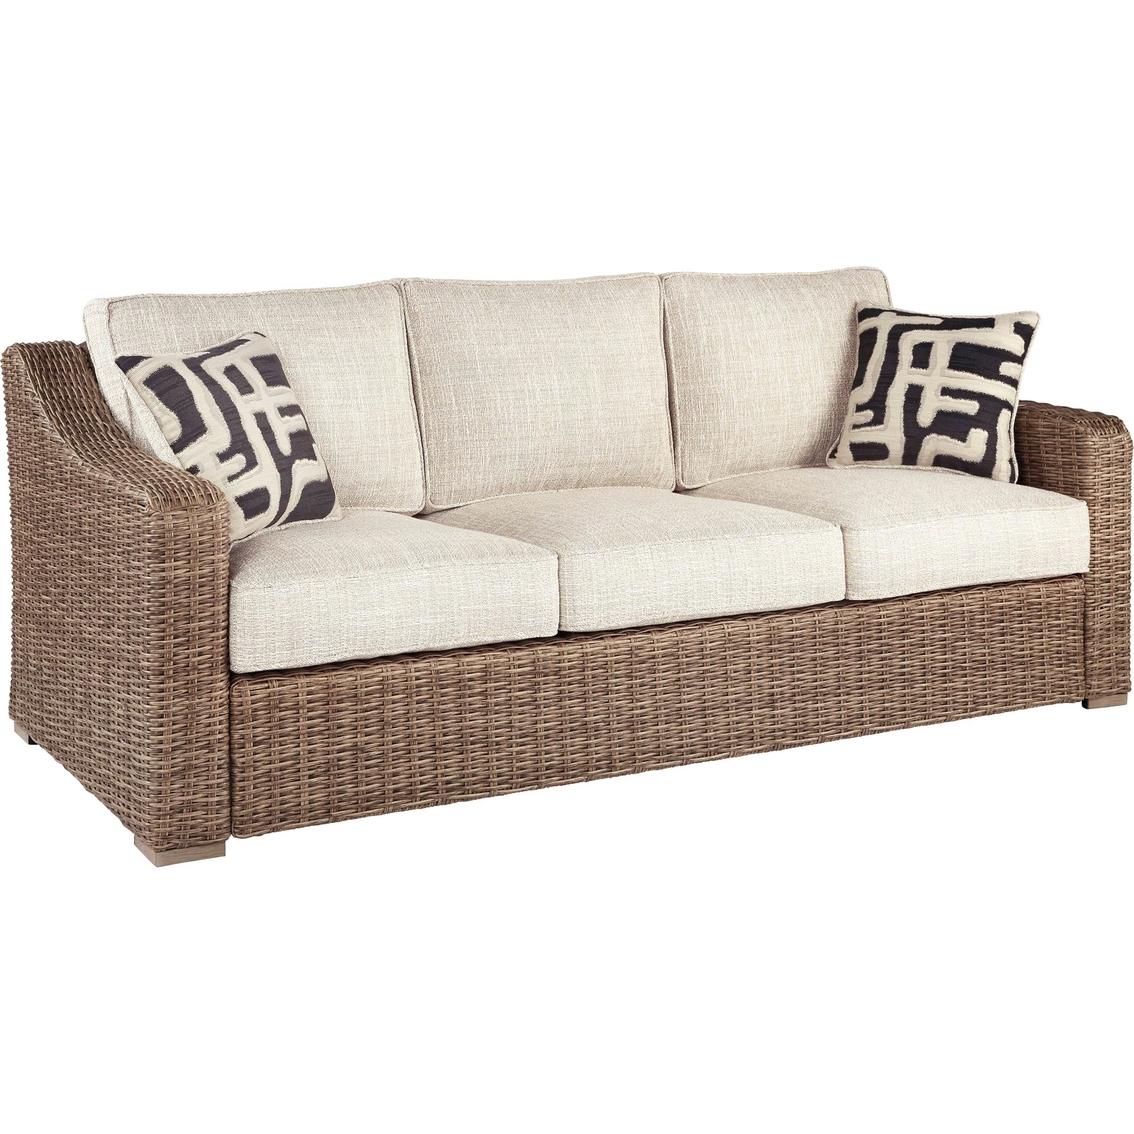 Astonishing Ashley Beachcroft Sofa Adirondack Furniture More Shop Pabps2019 Chair Design Images Pabps2019Com